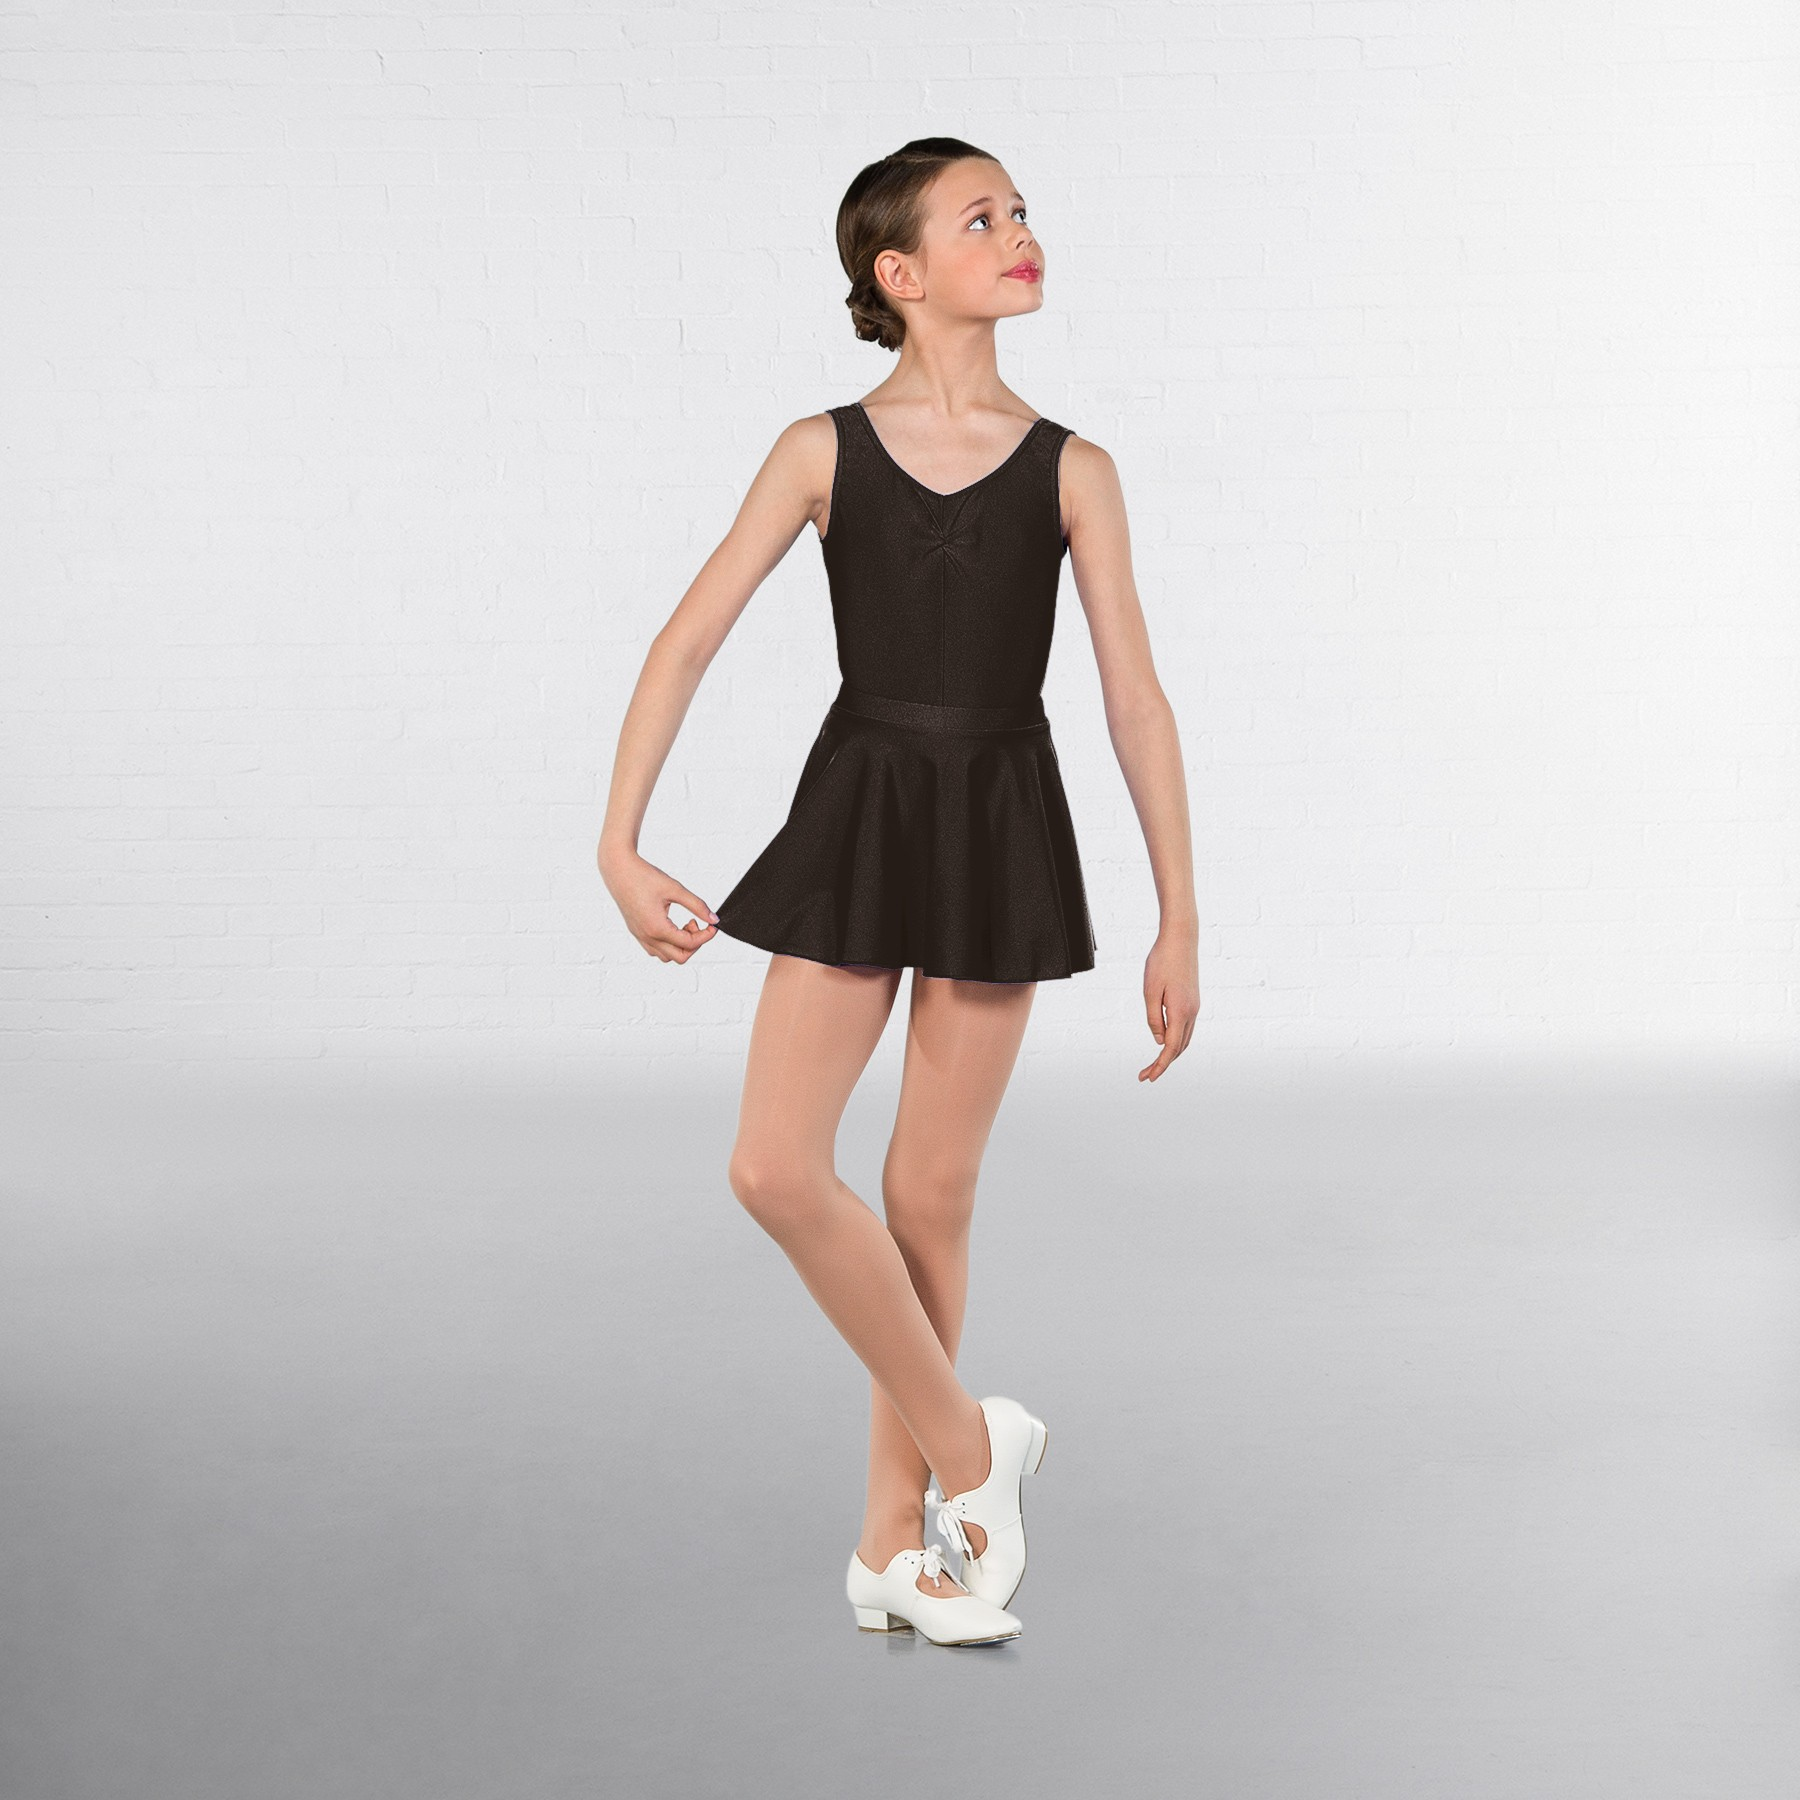 1st Position Circular Skirt (Black)